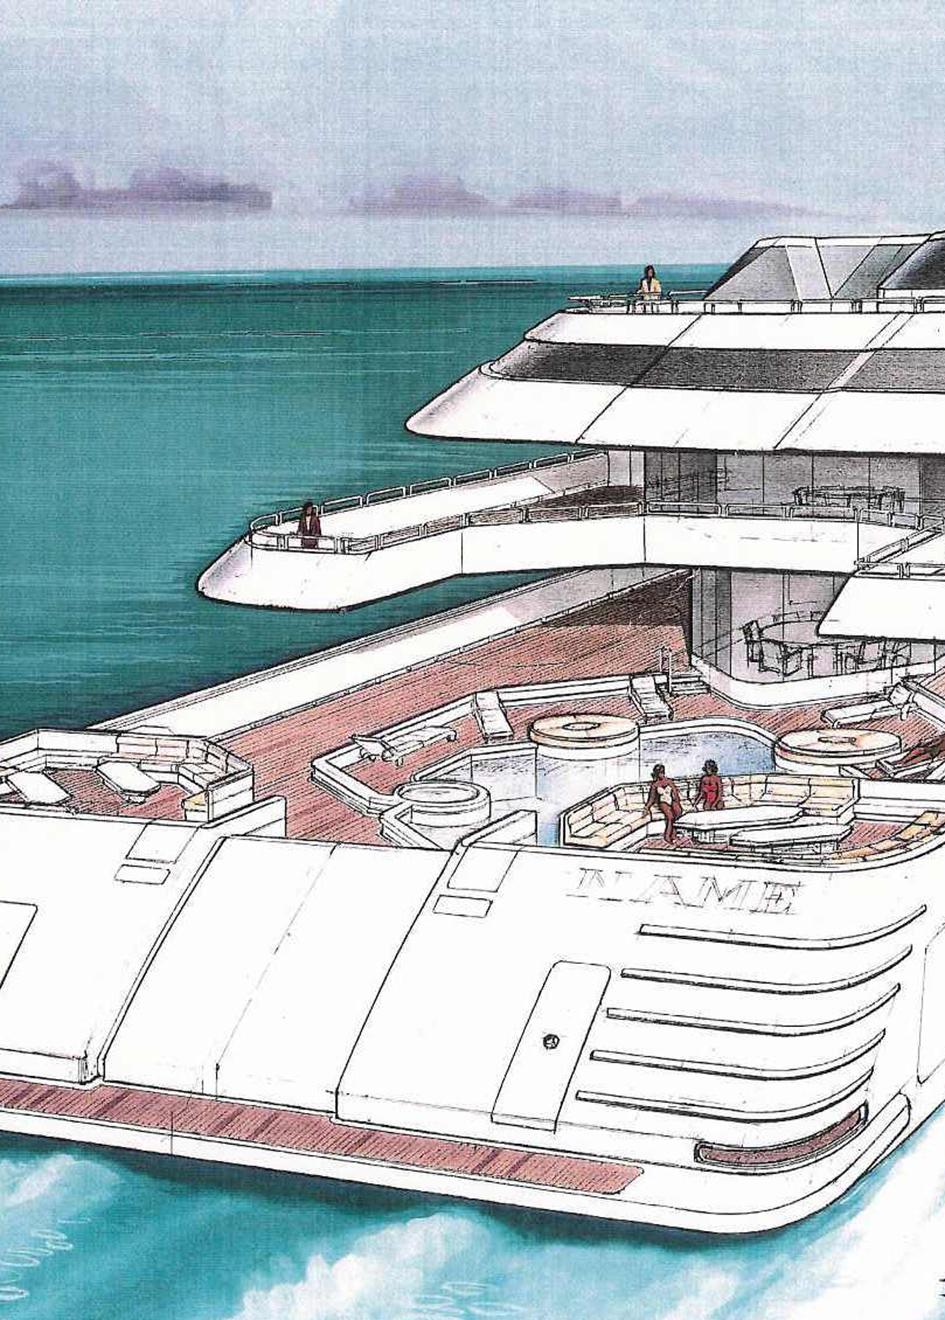 the-aft-deck-of-oliver-yacht-design-concept-trump-princess-ii